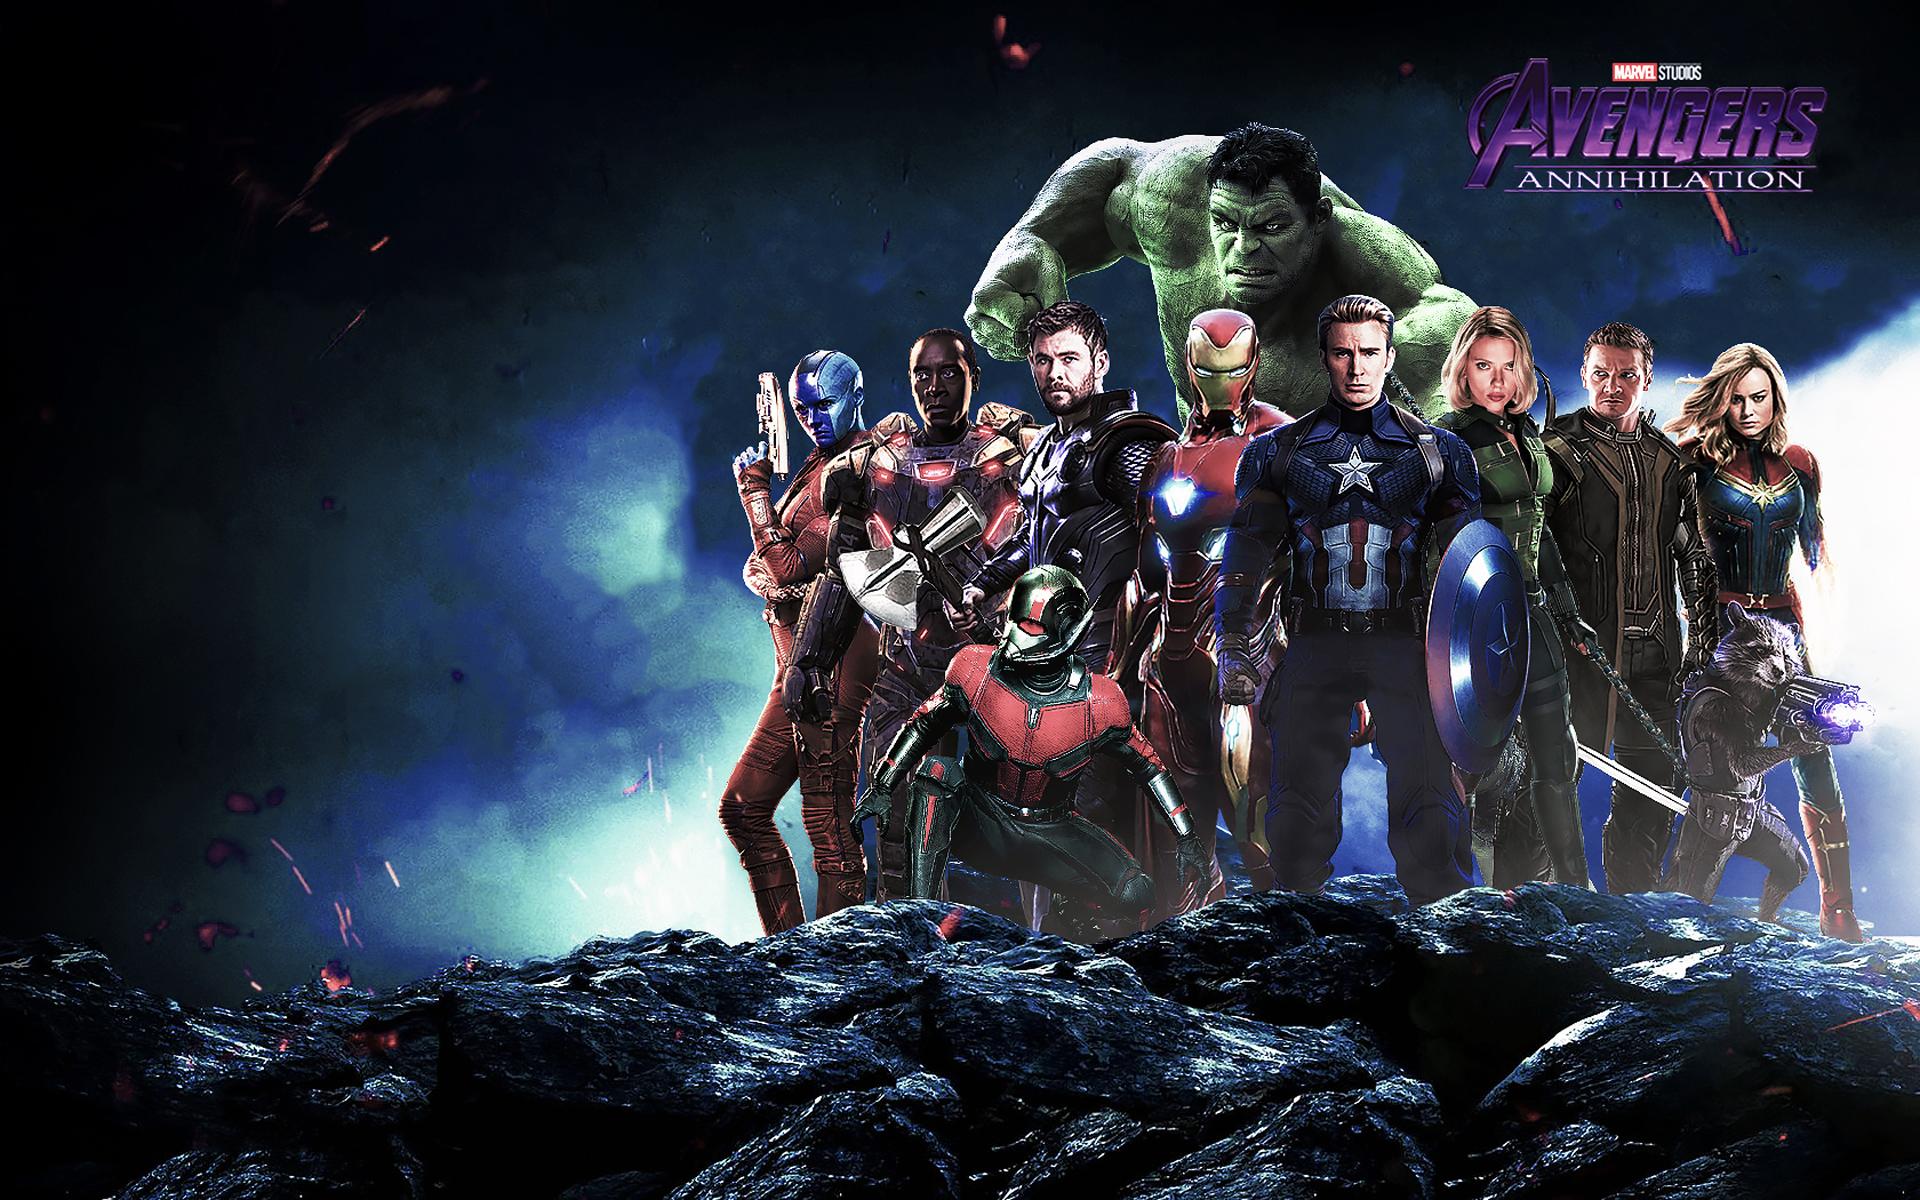 Wallpaper Avengers Endgame Avengers 4 Hd Movies 16872: Avengers Annihilation, HD Movies, 4k Wallpapers, Images